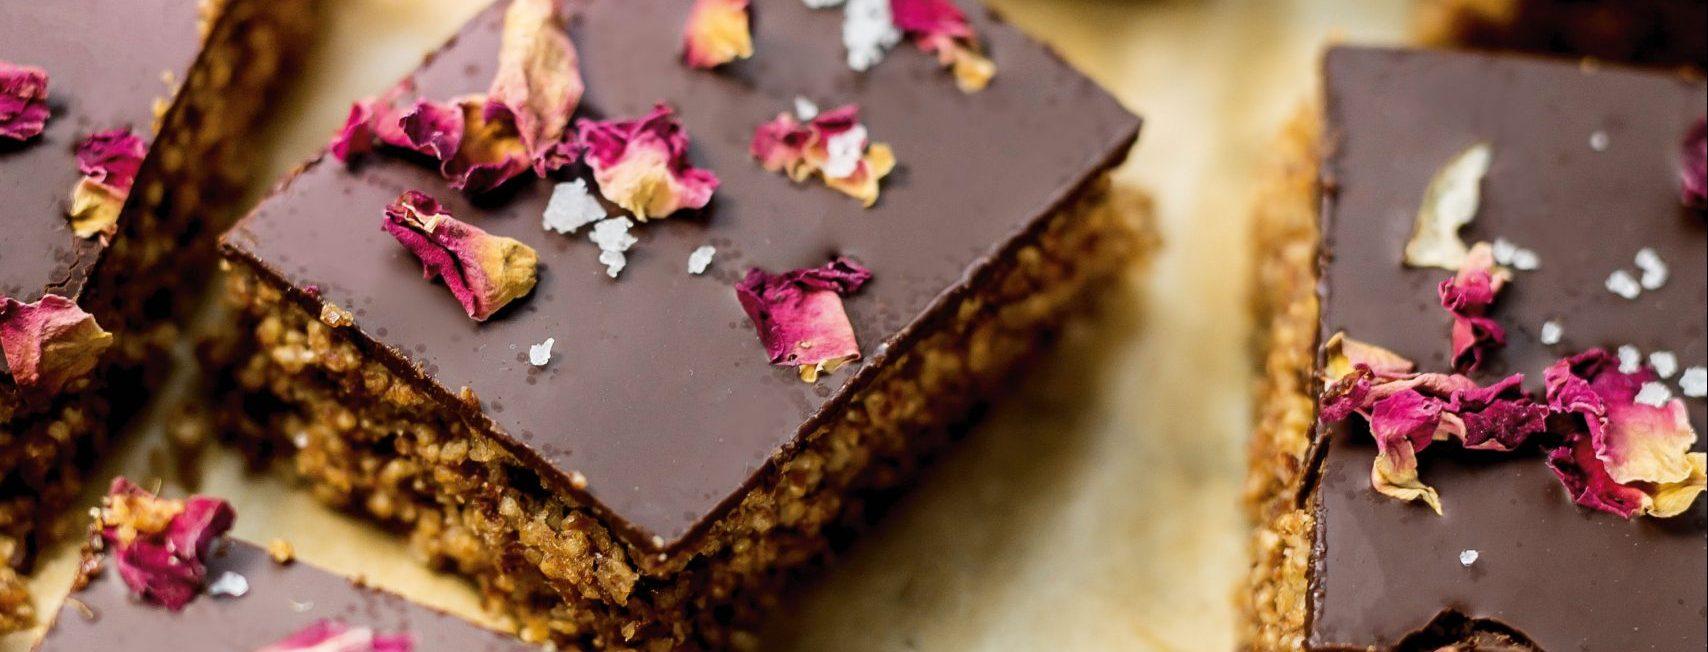 Storybild  amarantschnitten-mit-schokolade-fleur-de-sel-und-rosenblueten 02